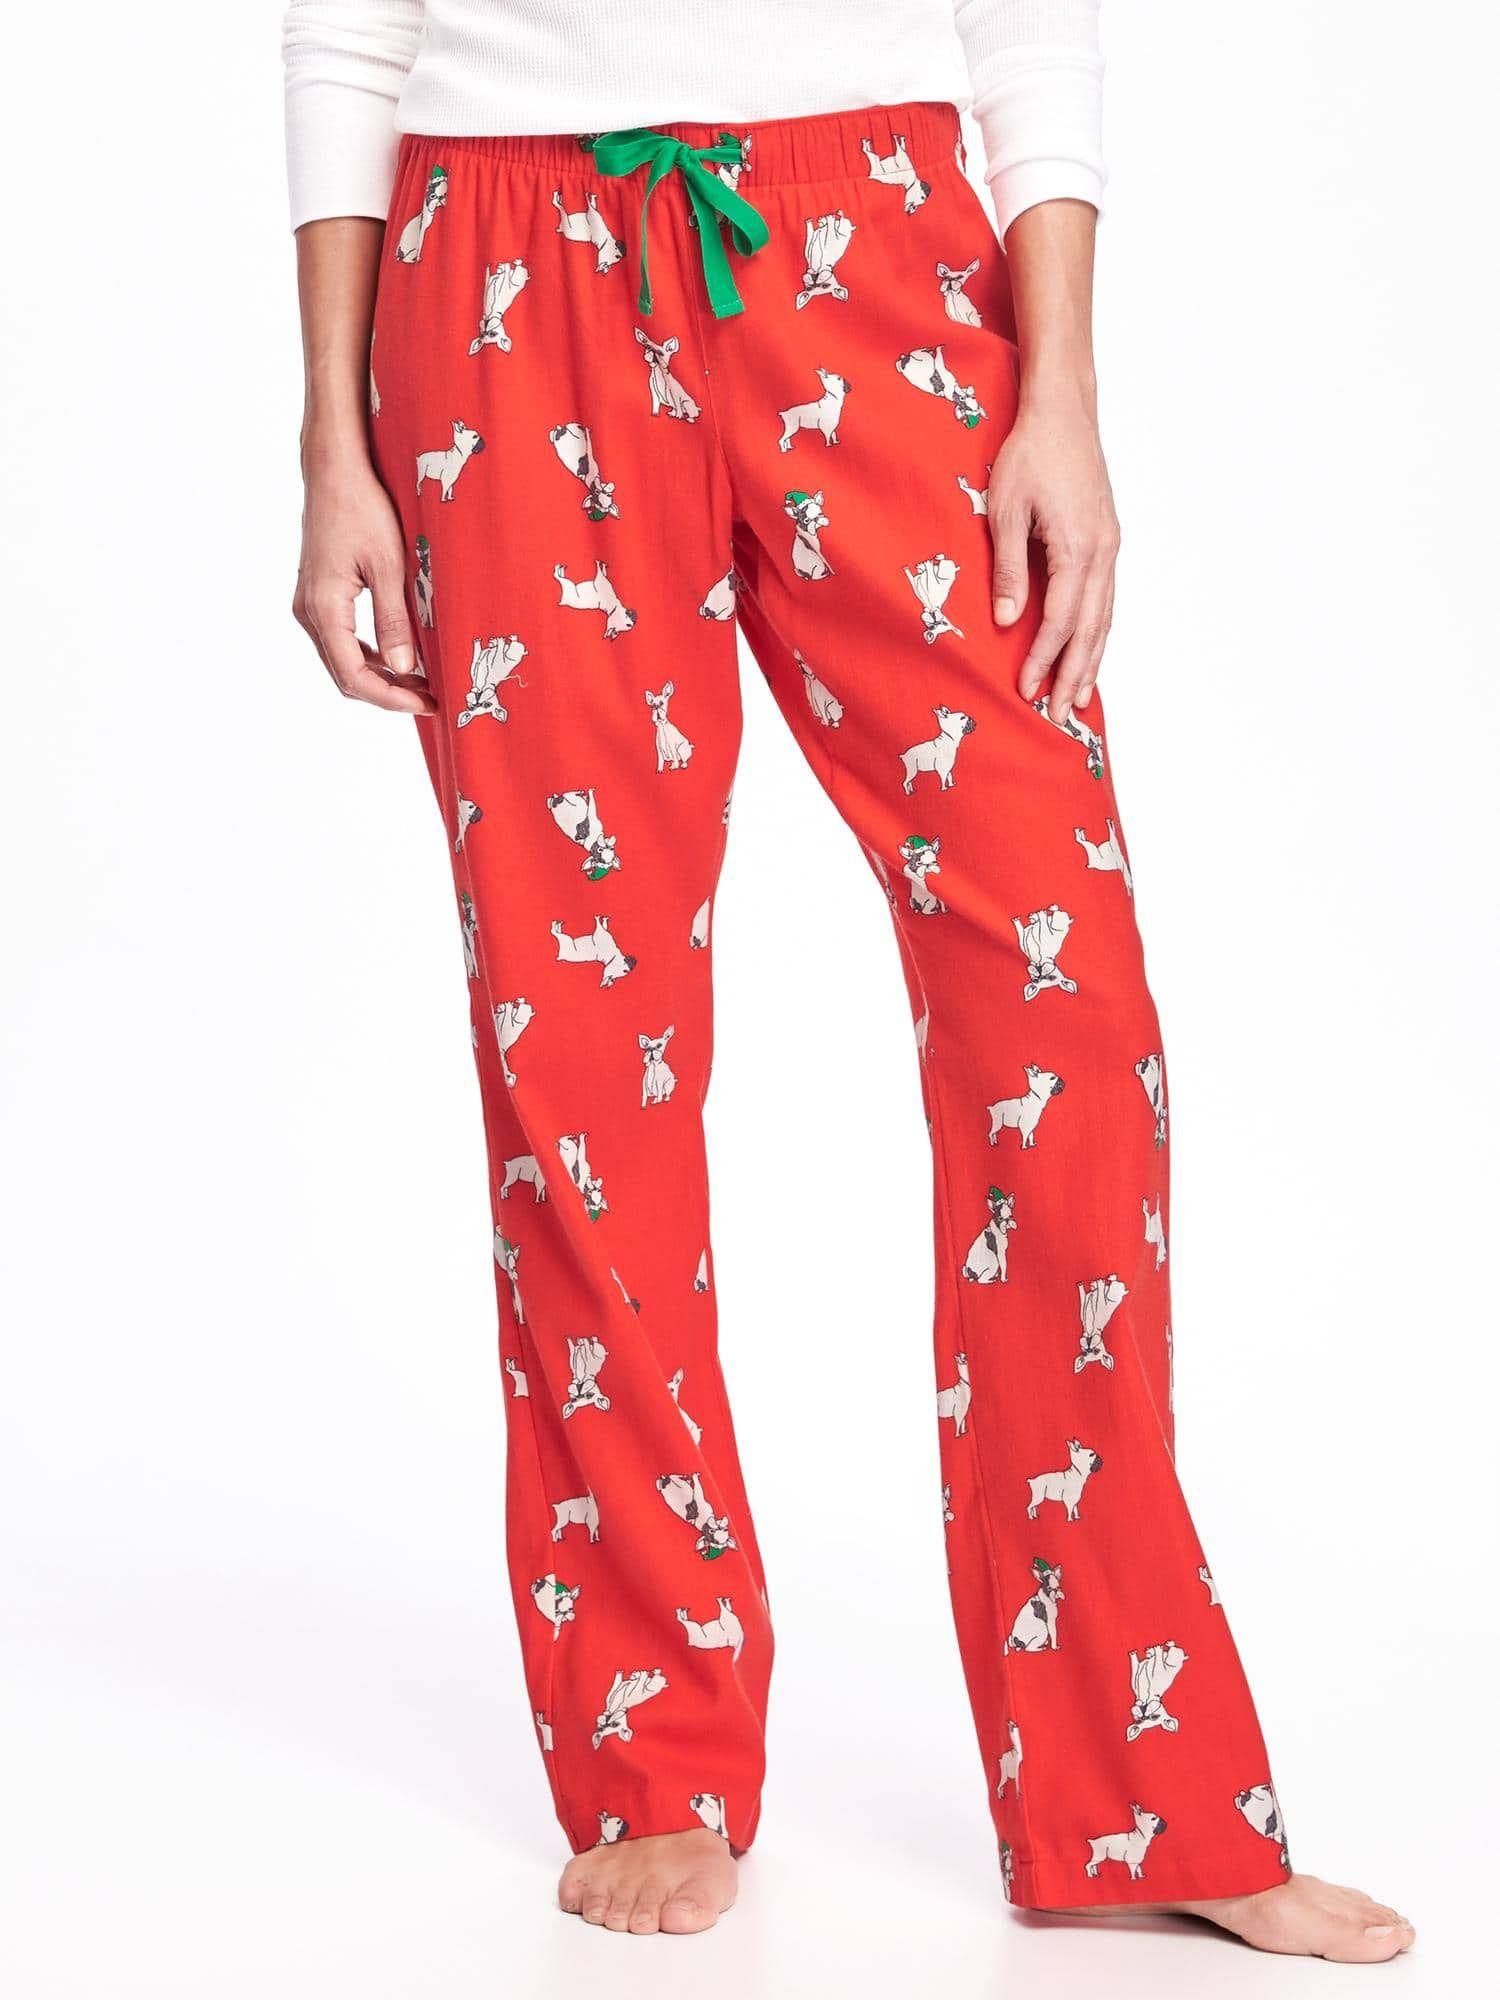 XS Flannel Drawstring Sleep Pants for Women   Old Navy   Wish List ...